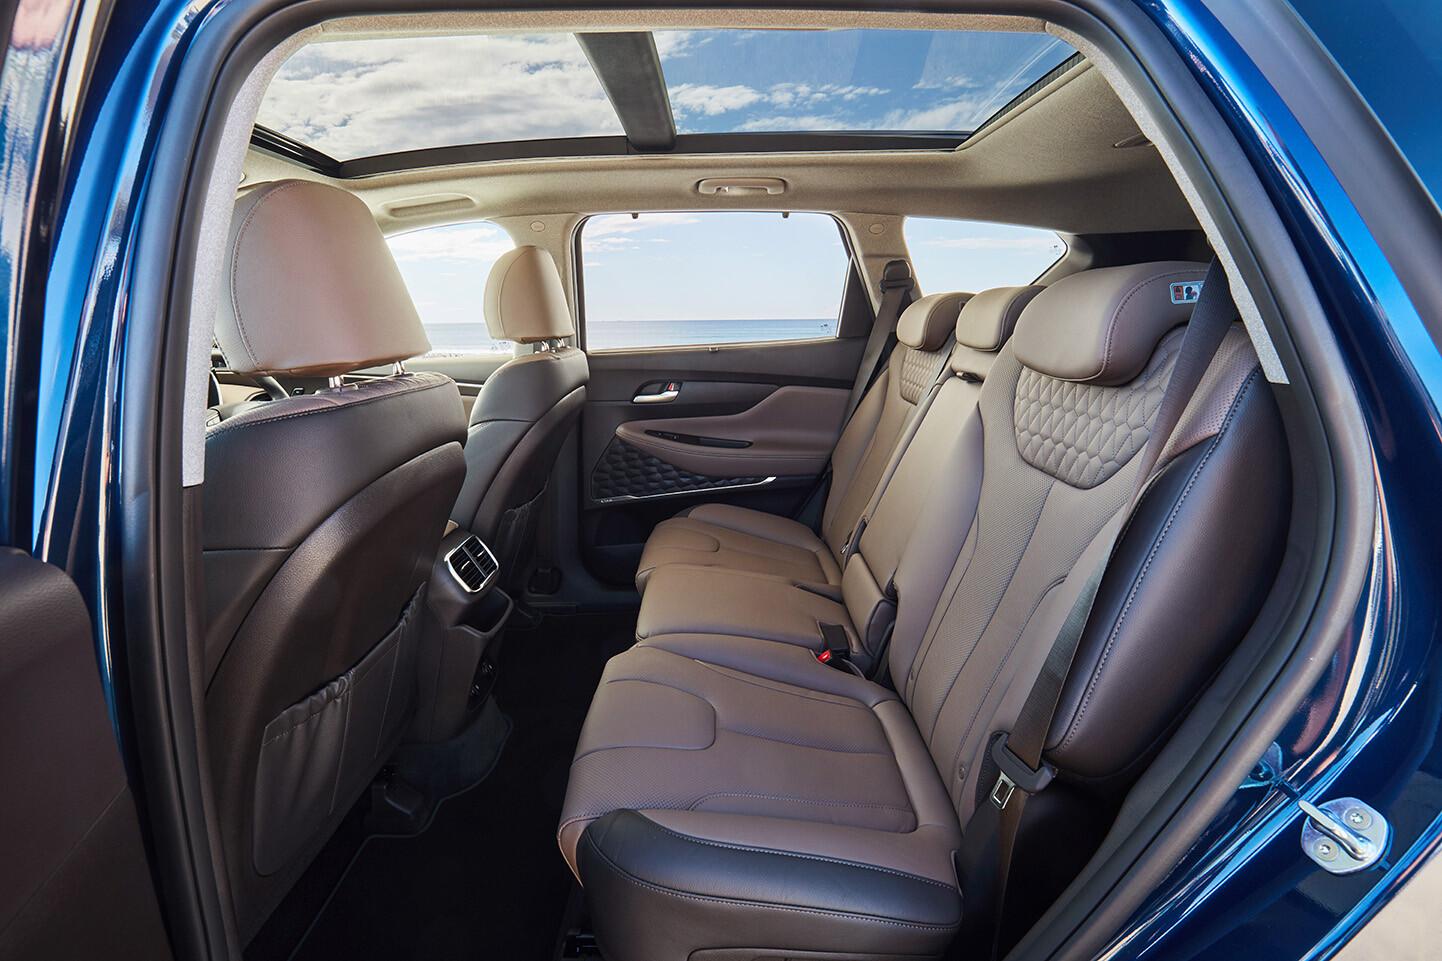 Hyundai Santa Fe middle row